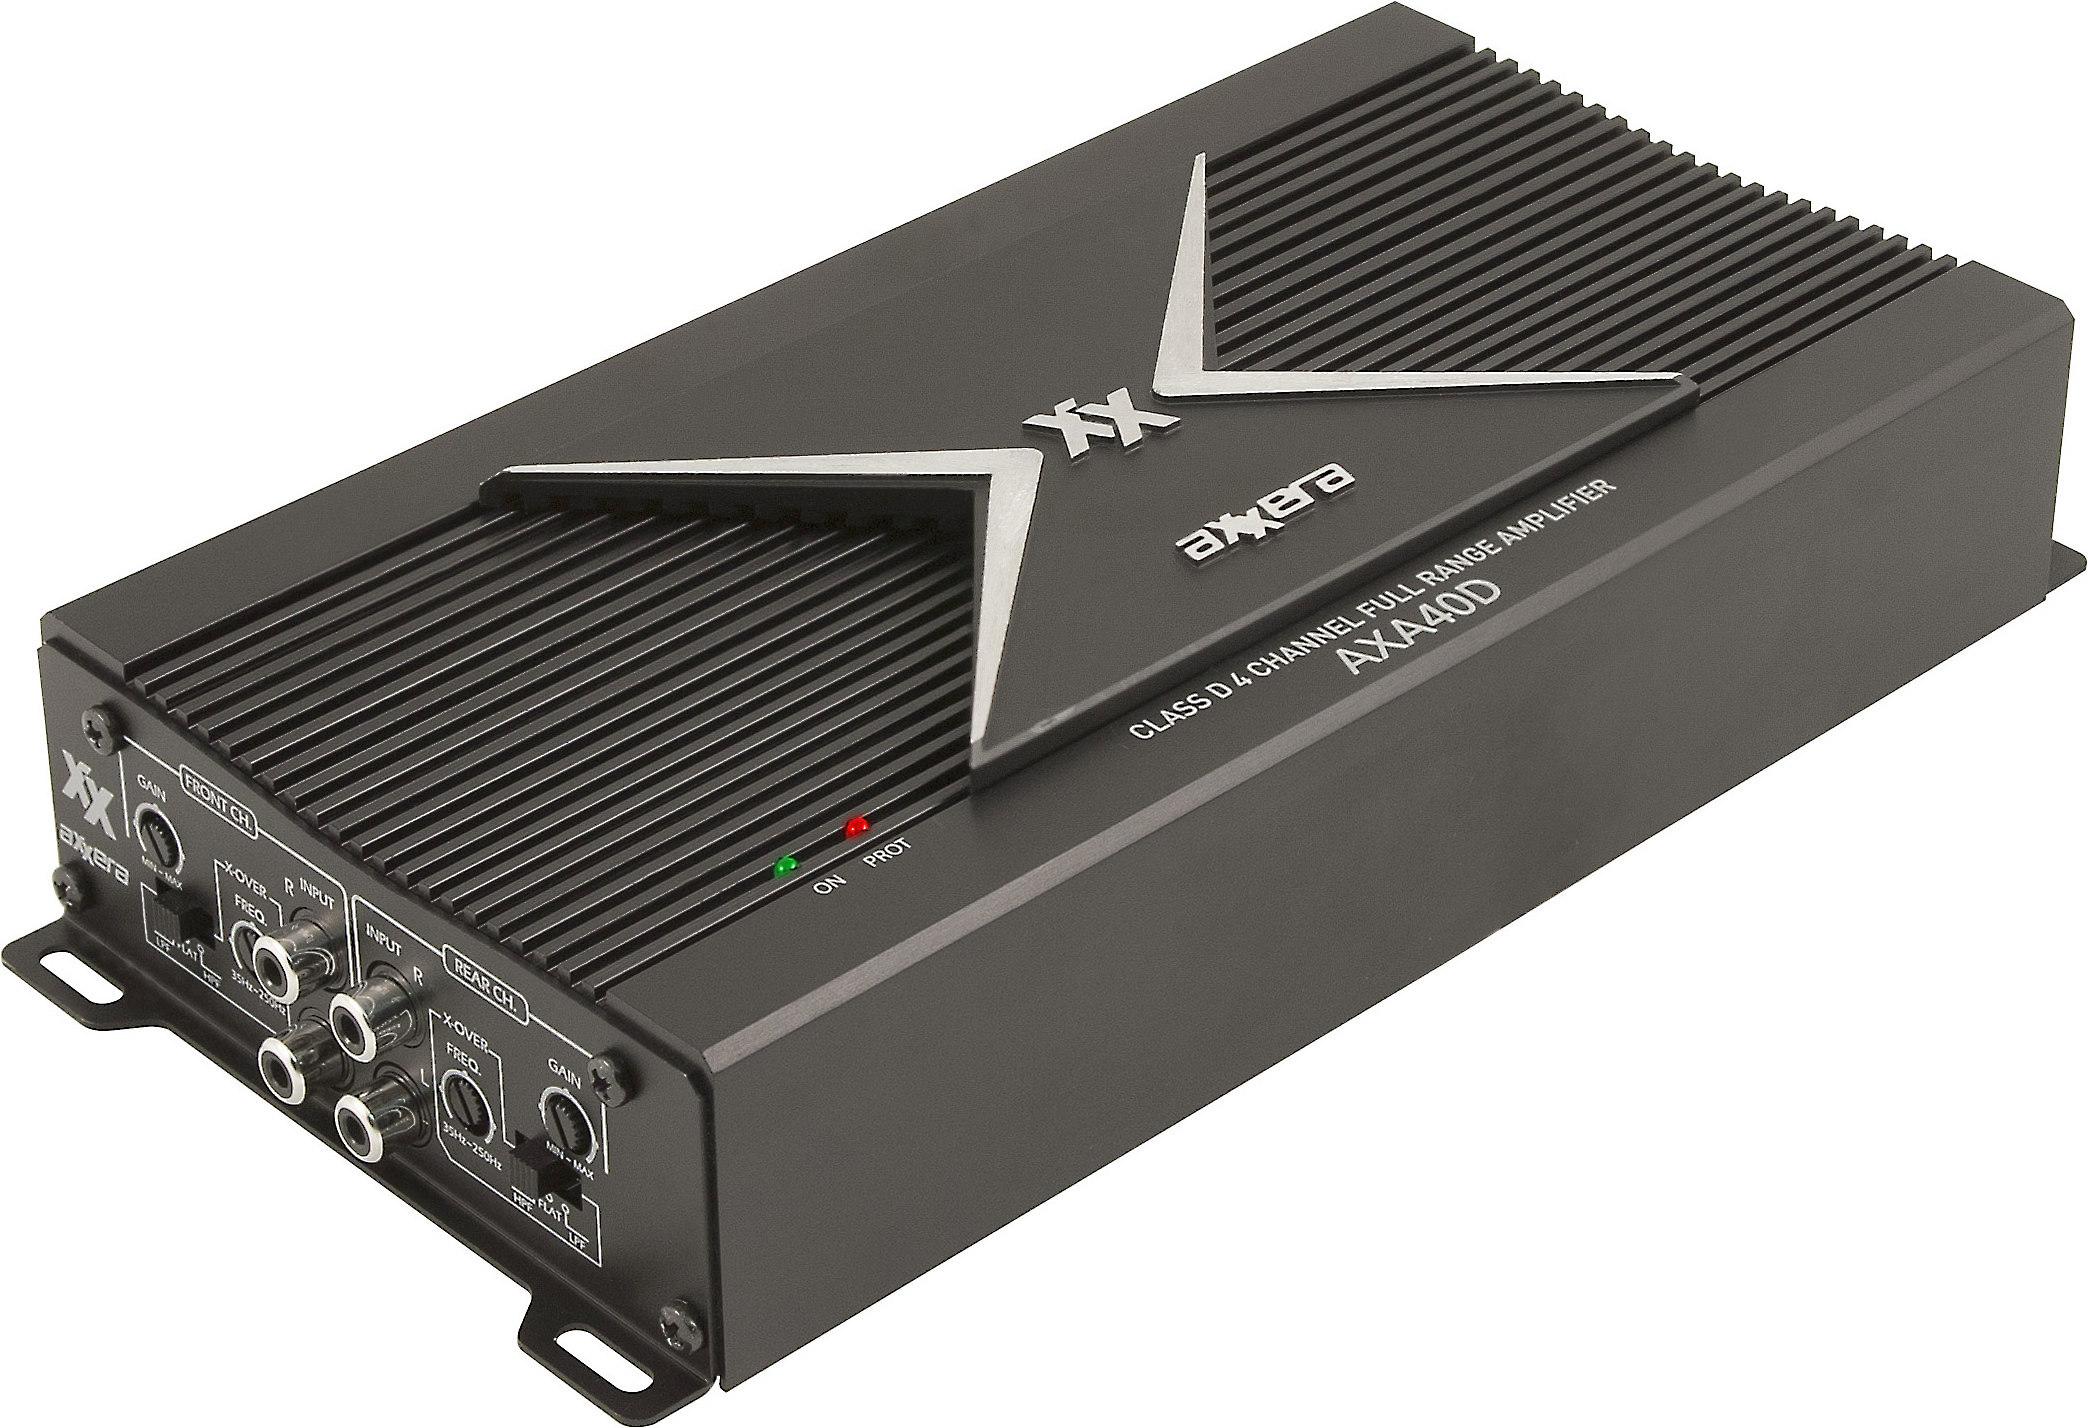 644e4c31 Axxera AXA40D AXA Series 4-channel car amplifier — 100 watts RMS x 4 at  Crutchfield.com